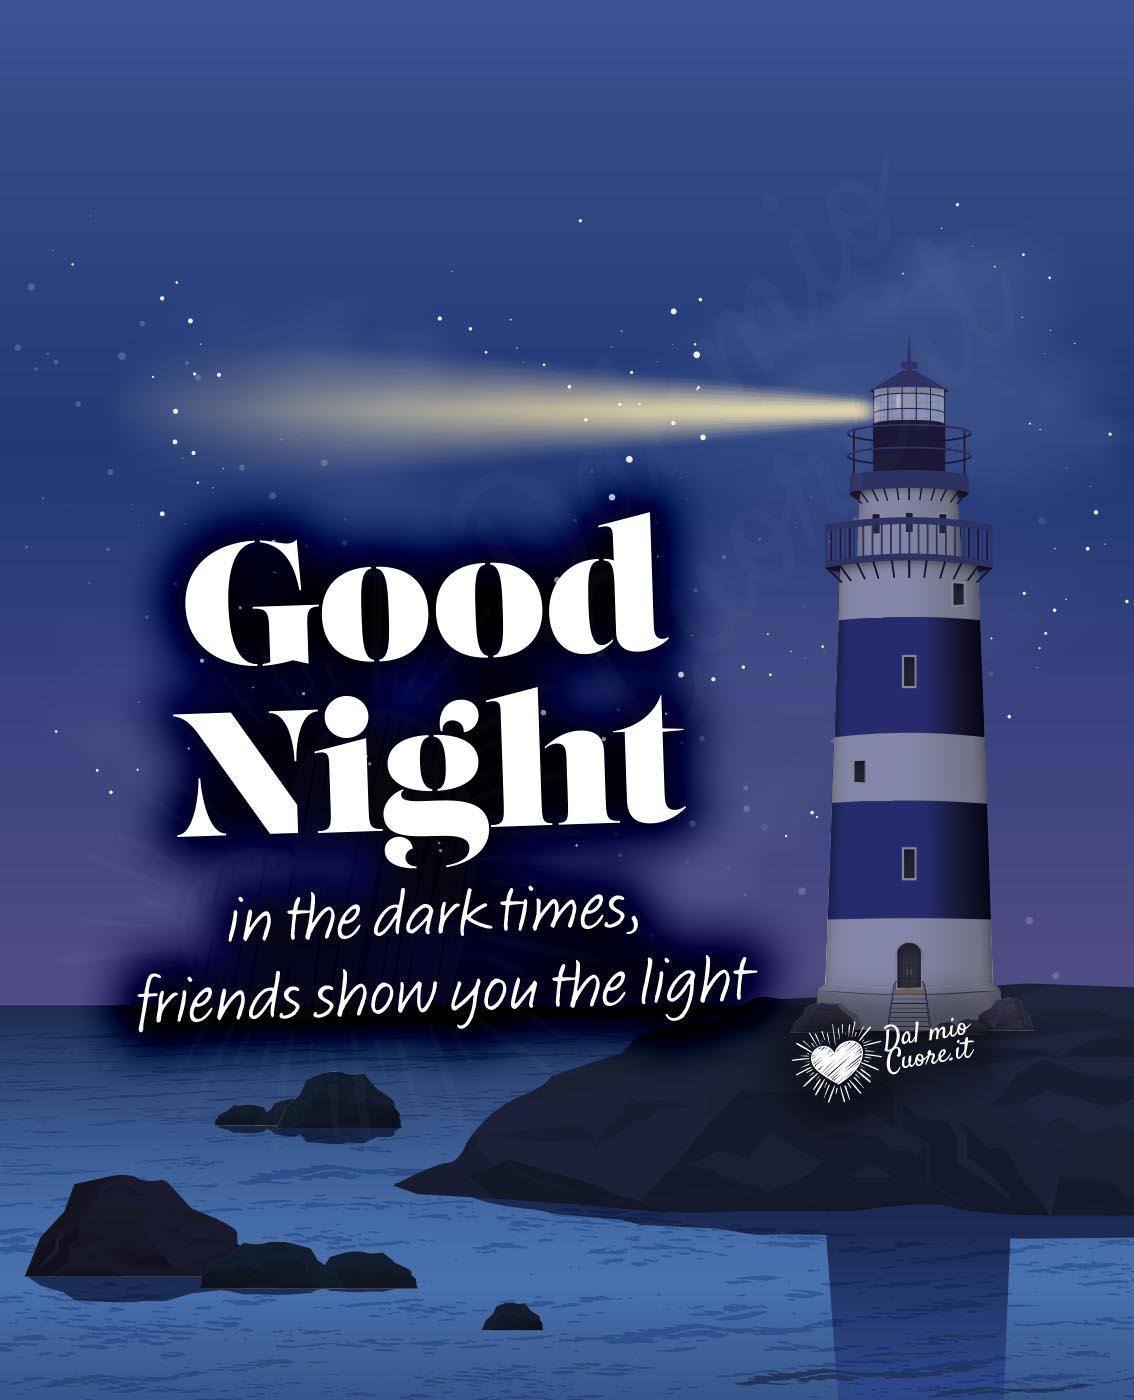 Sweet kostenlos dreams bilder night good Good Night